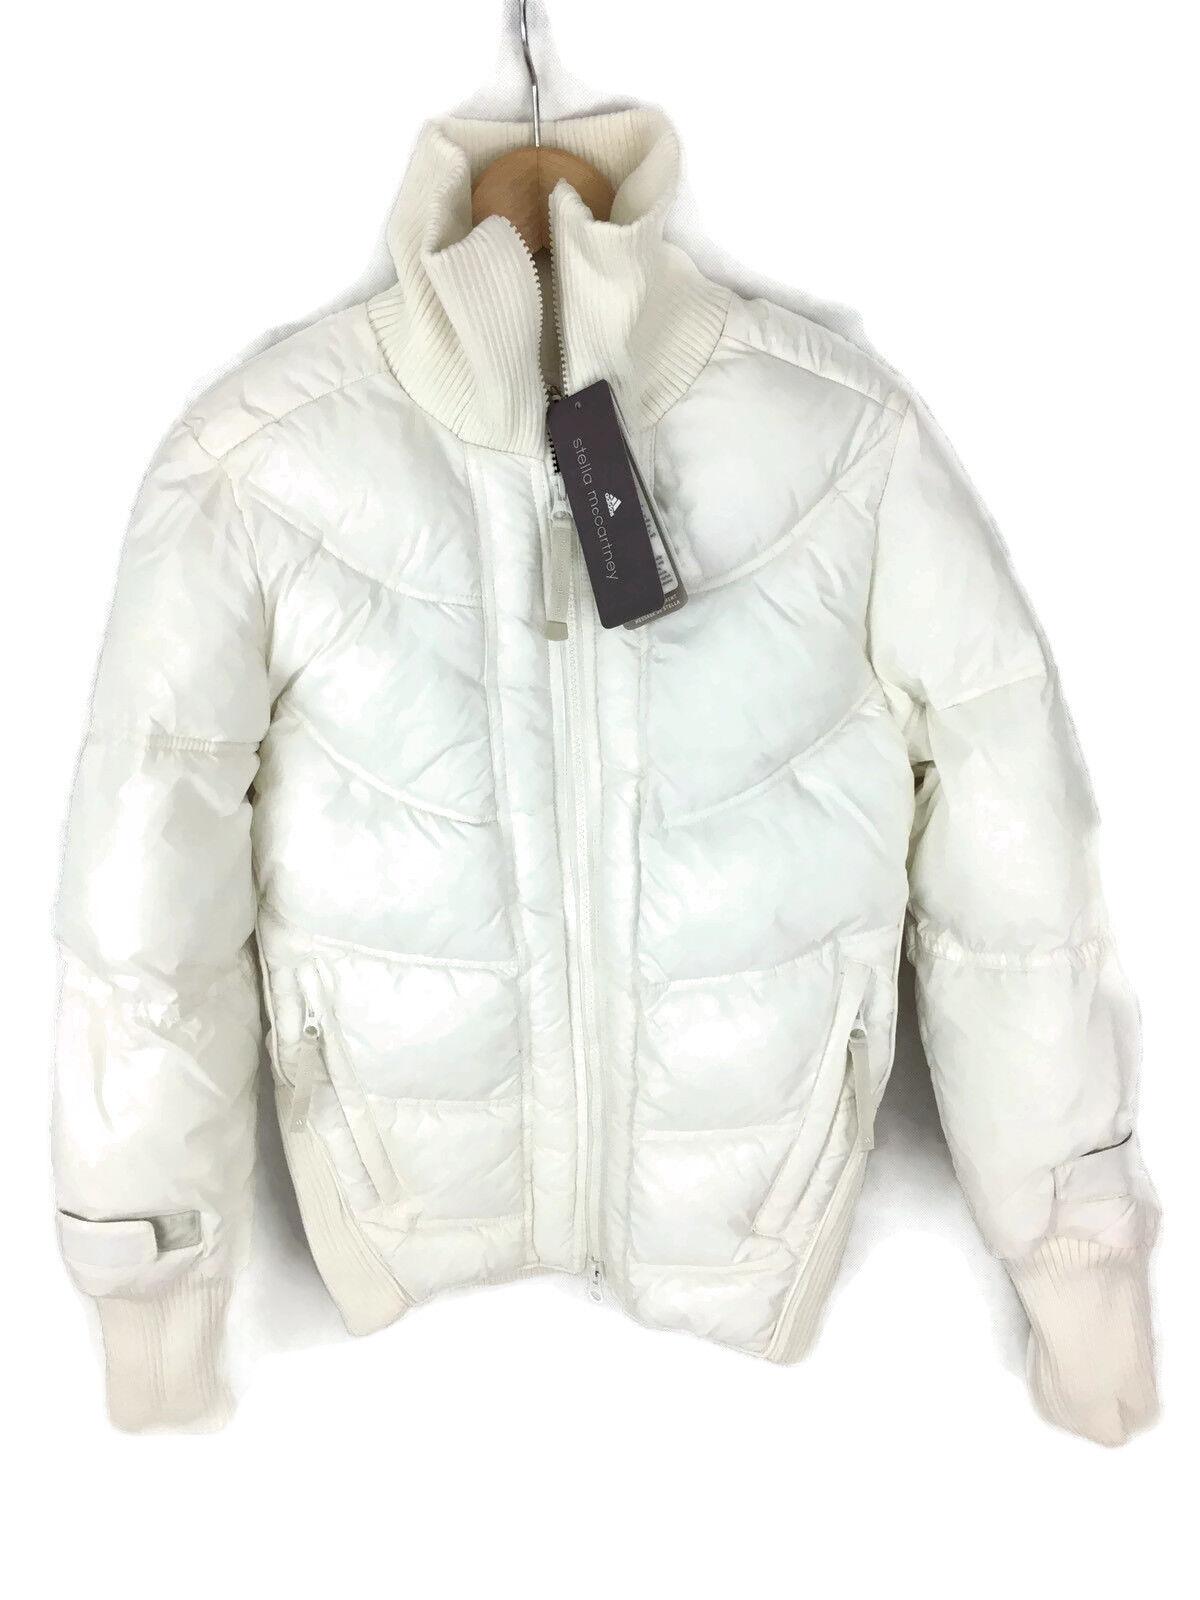 Adidas Stella McCochetney Mujeres Chaqueta  Acolchada-blancoo-UK 8 EU 34   Nuevo  Sin impuestos